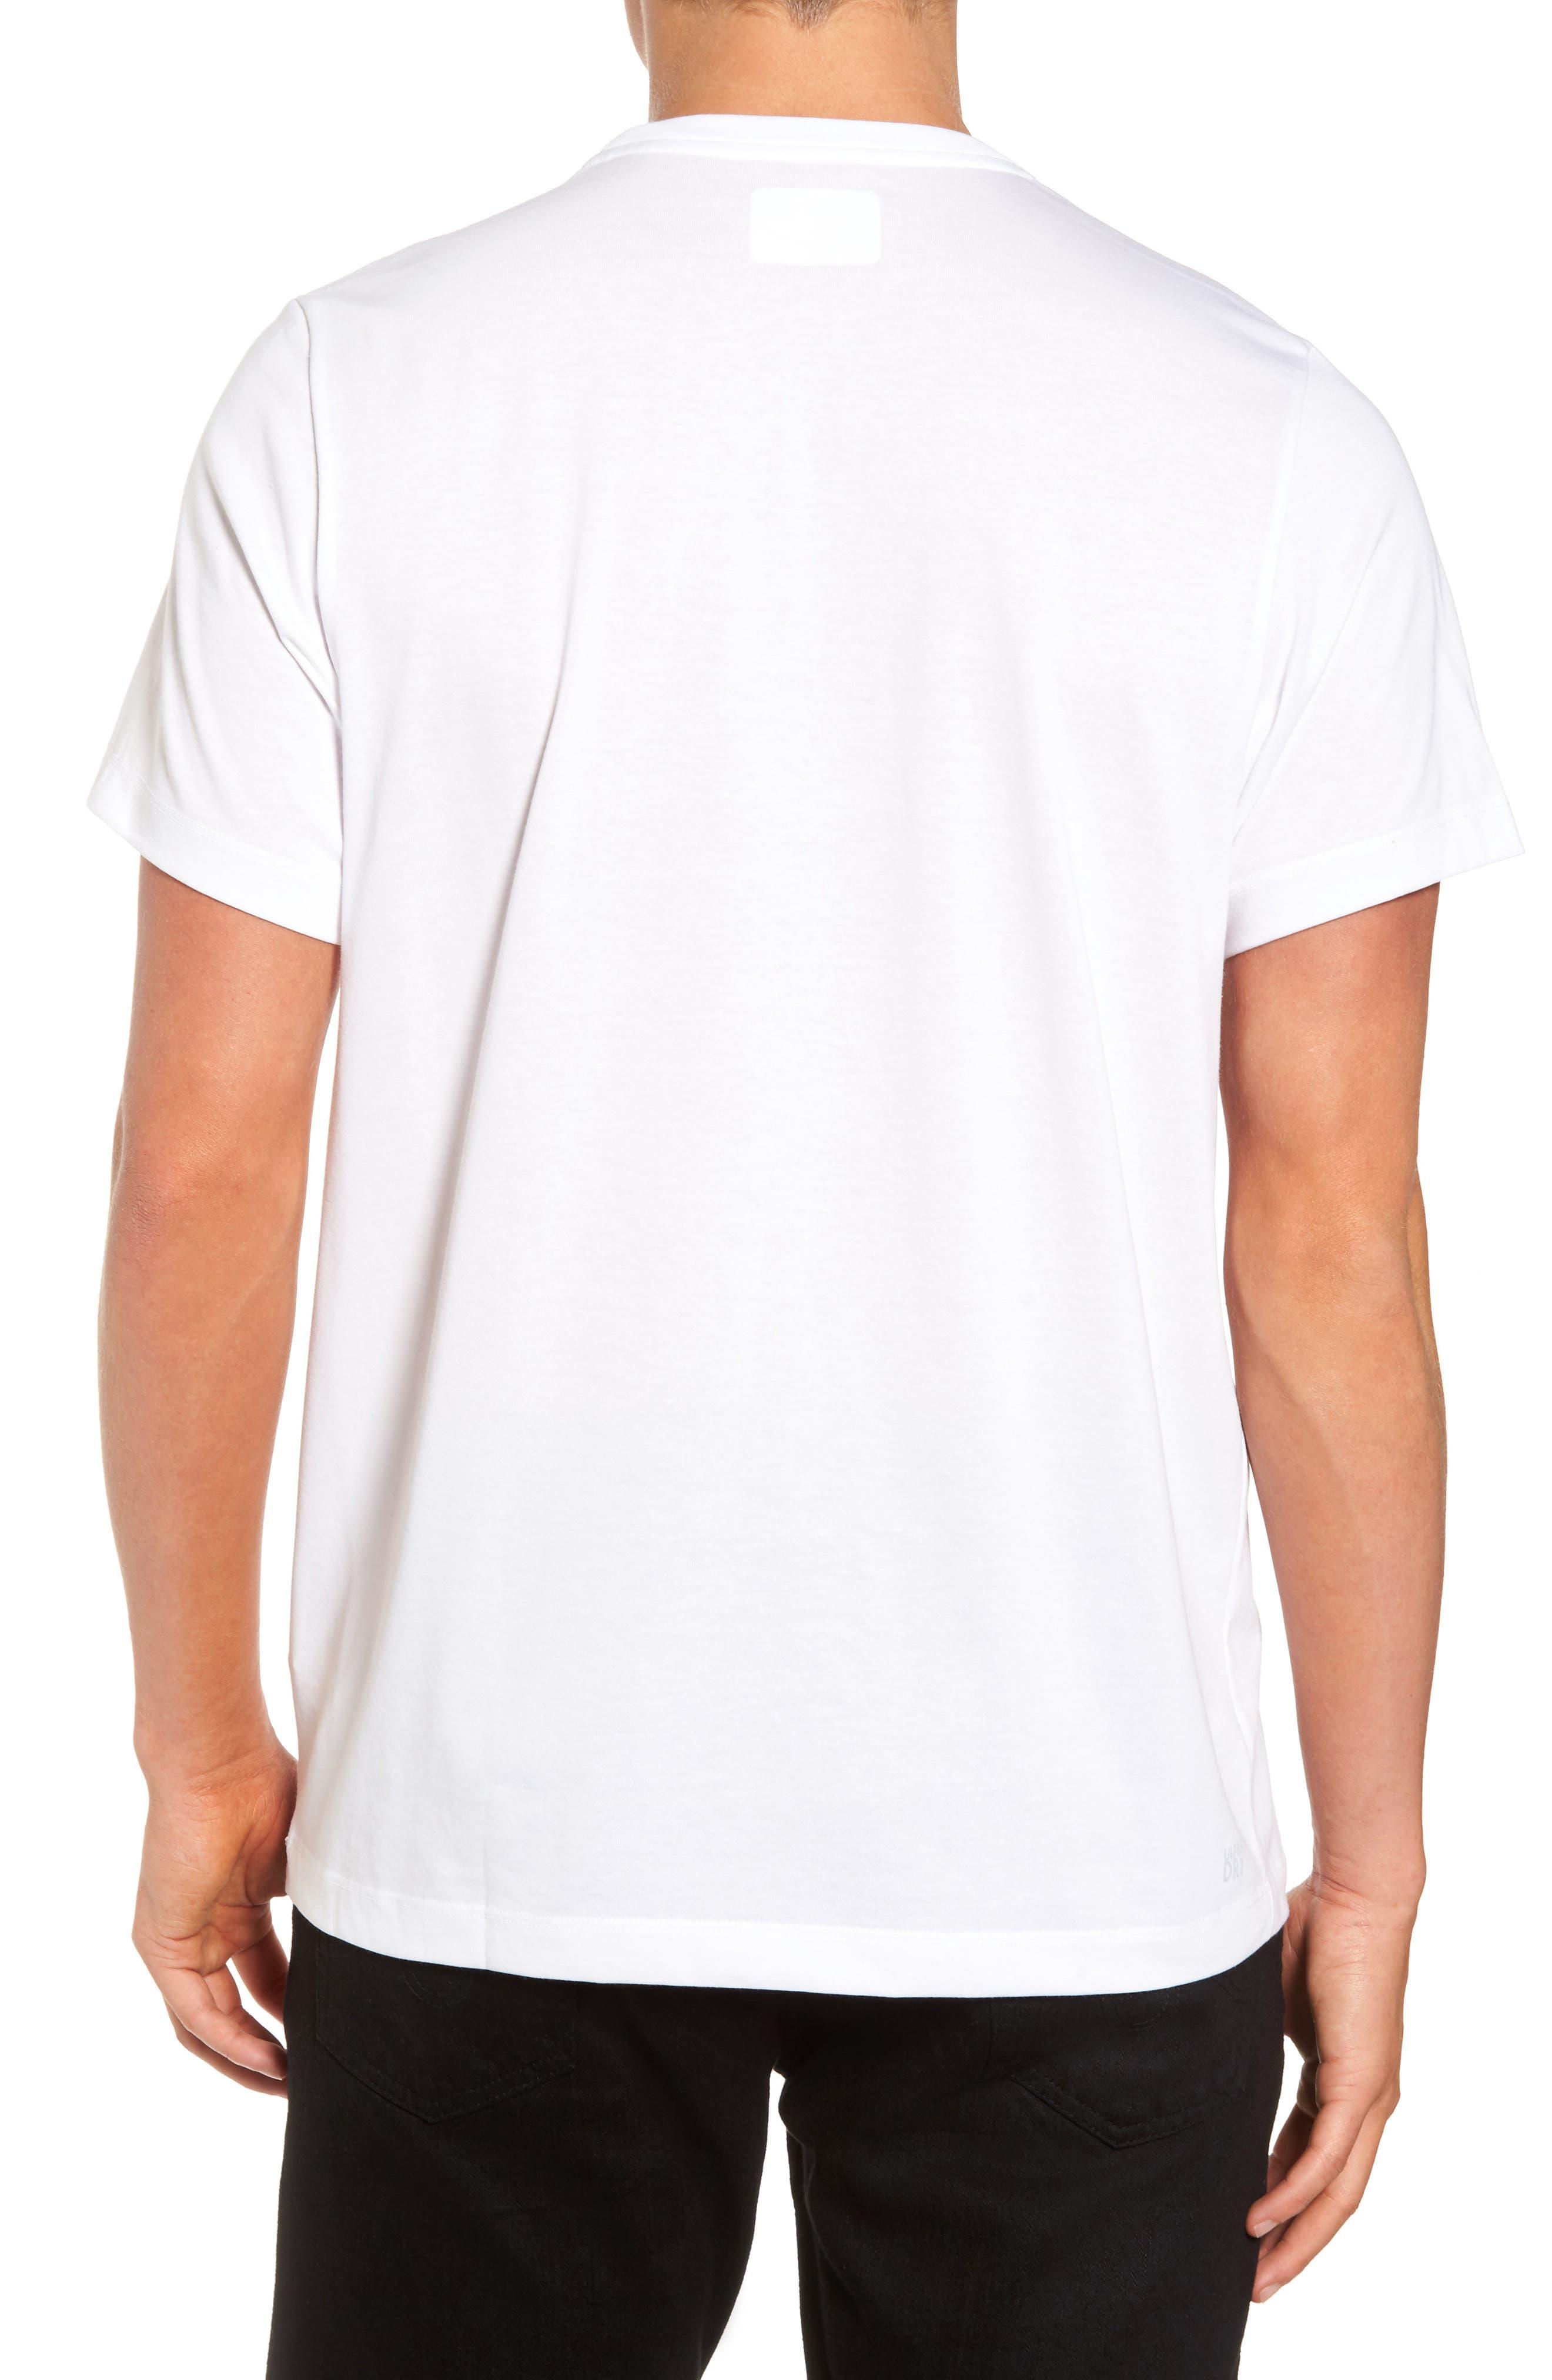 Tech Vertical Stripe Graphic T-Shirt,                             Alternate thumbnail 2, color,                             U88 White/ Ocean-Ladybird-Blac